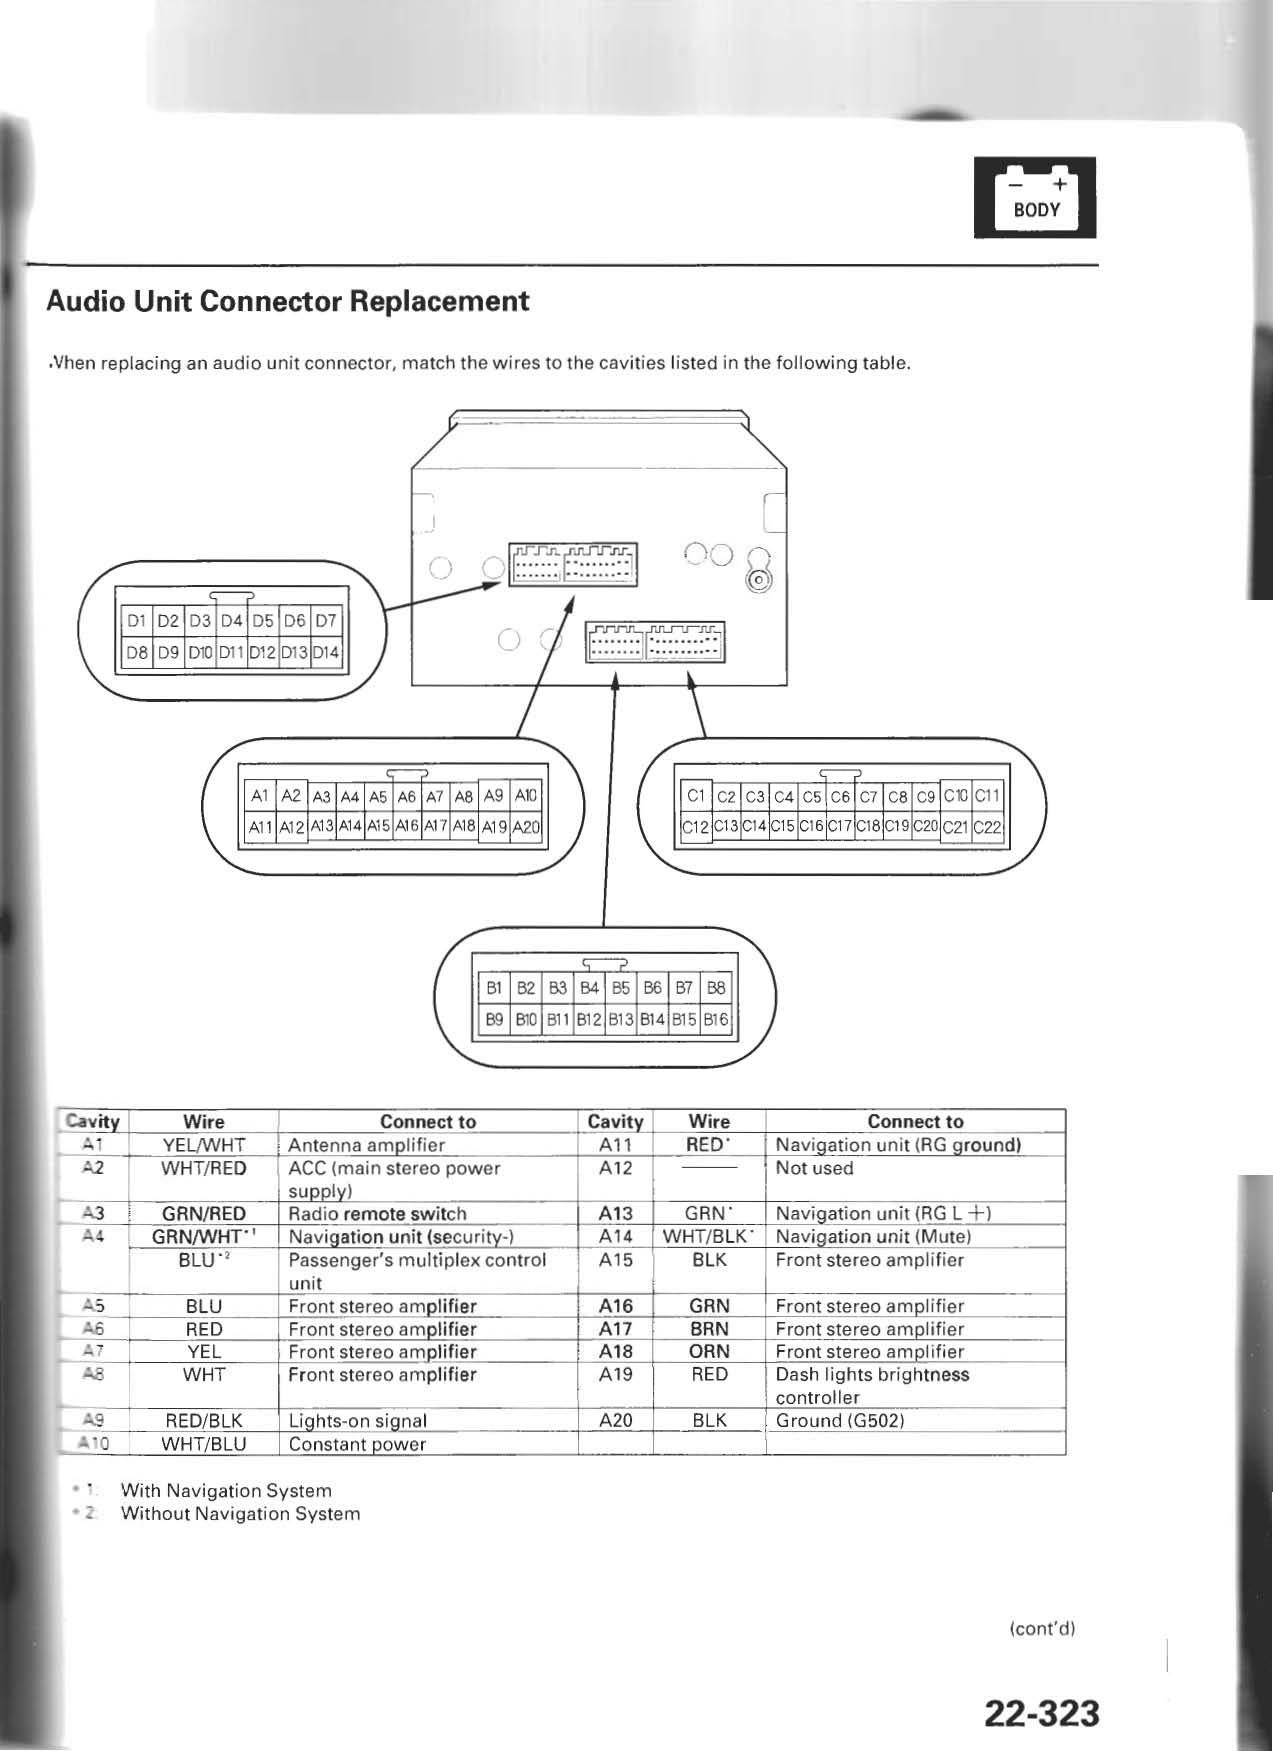 Diagram 2015 Acura Mdx Car Wiring Diagram Full Version Hd Quality Wiring Diagram Diagramlieuv Arborealive It